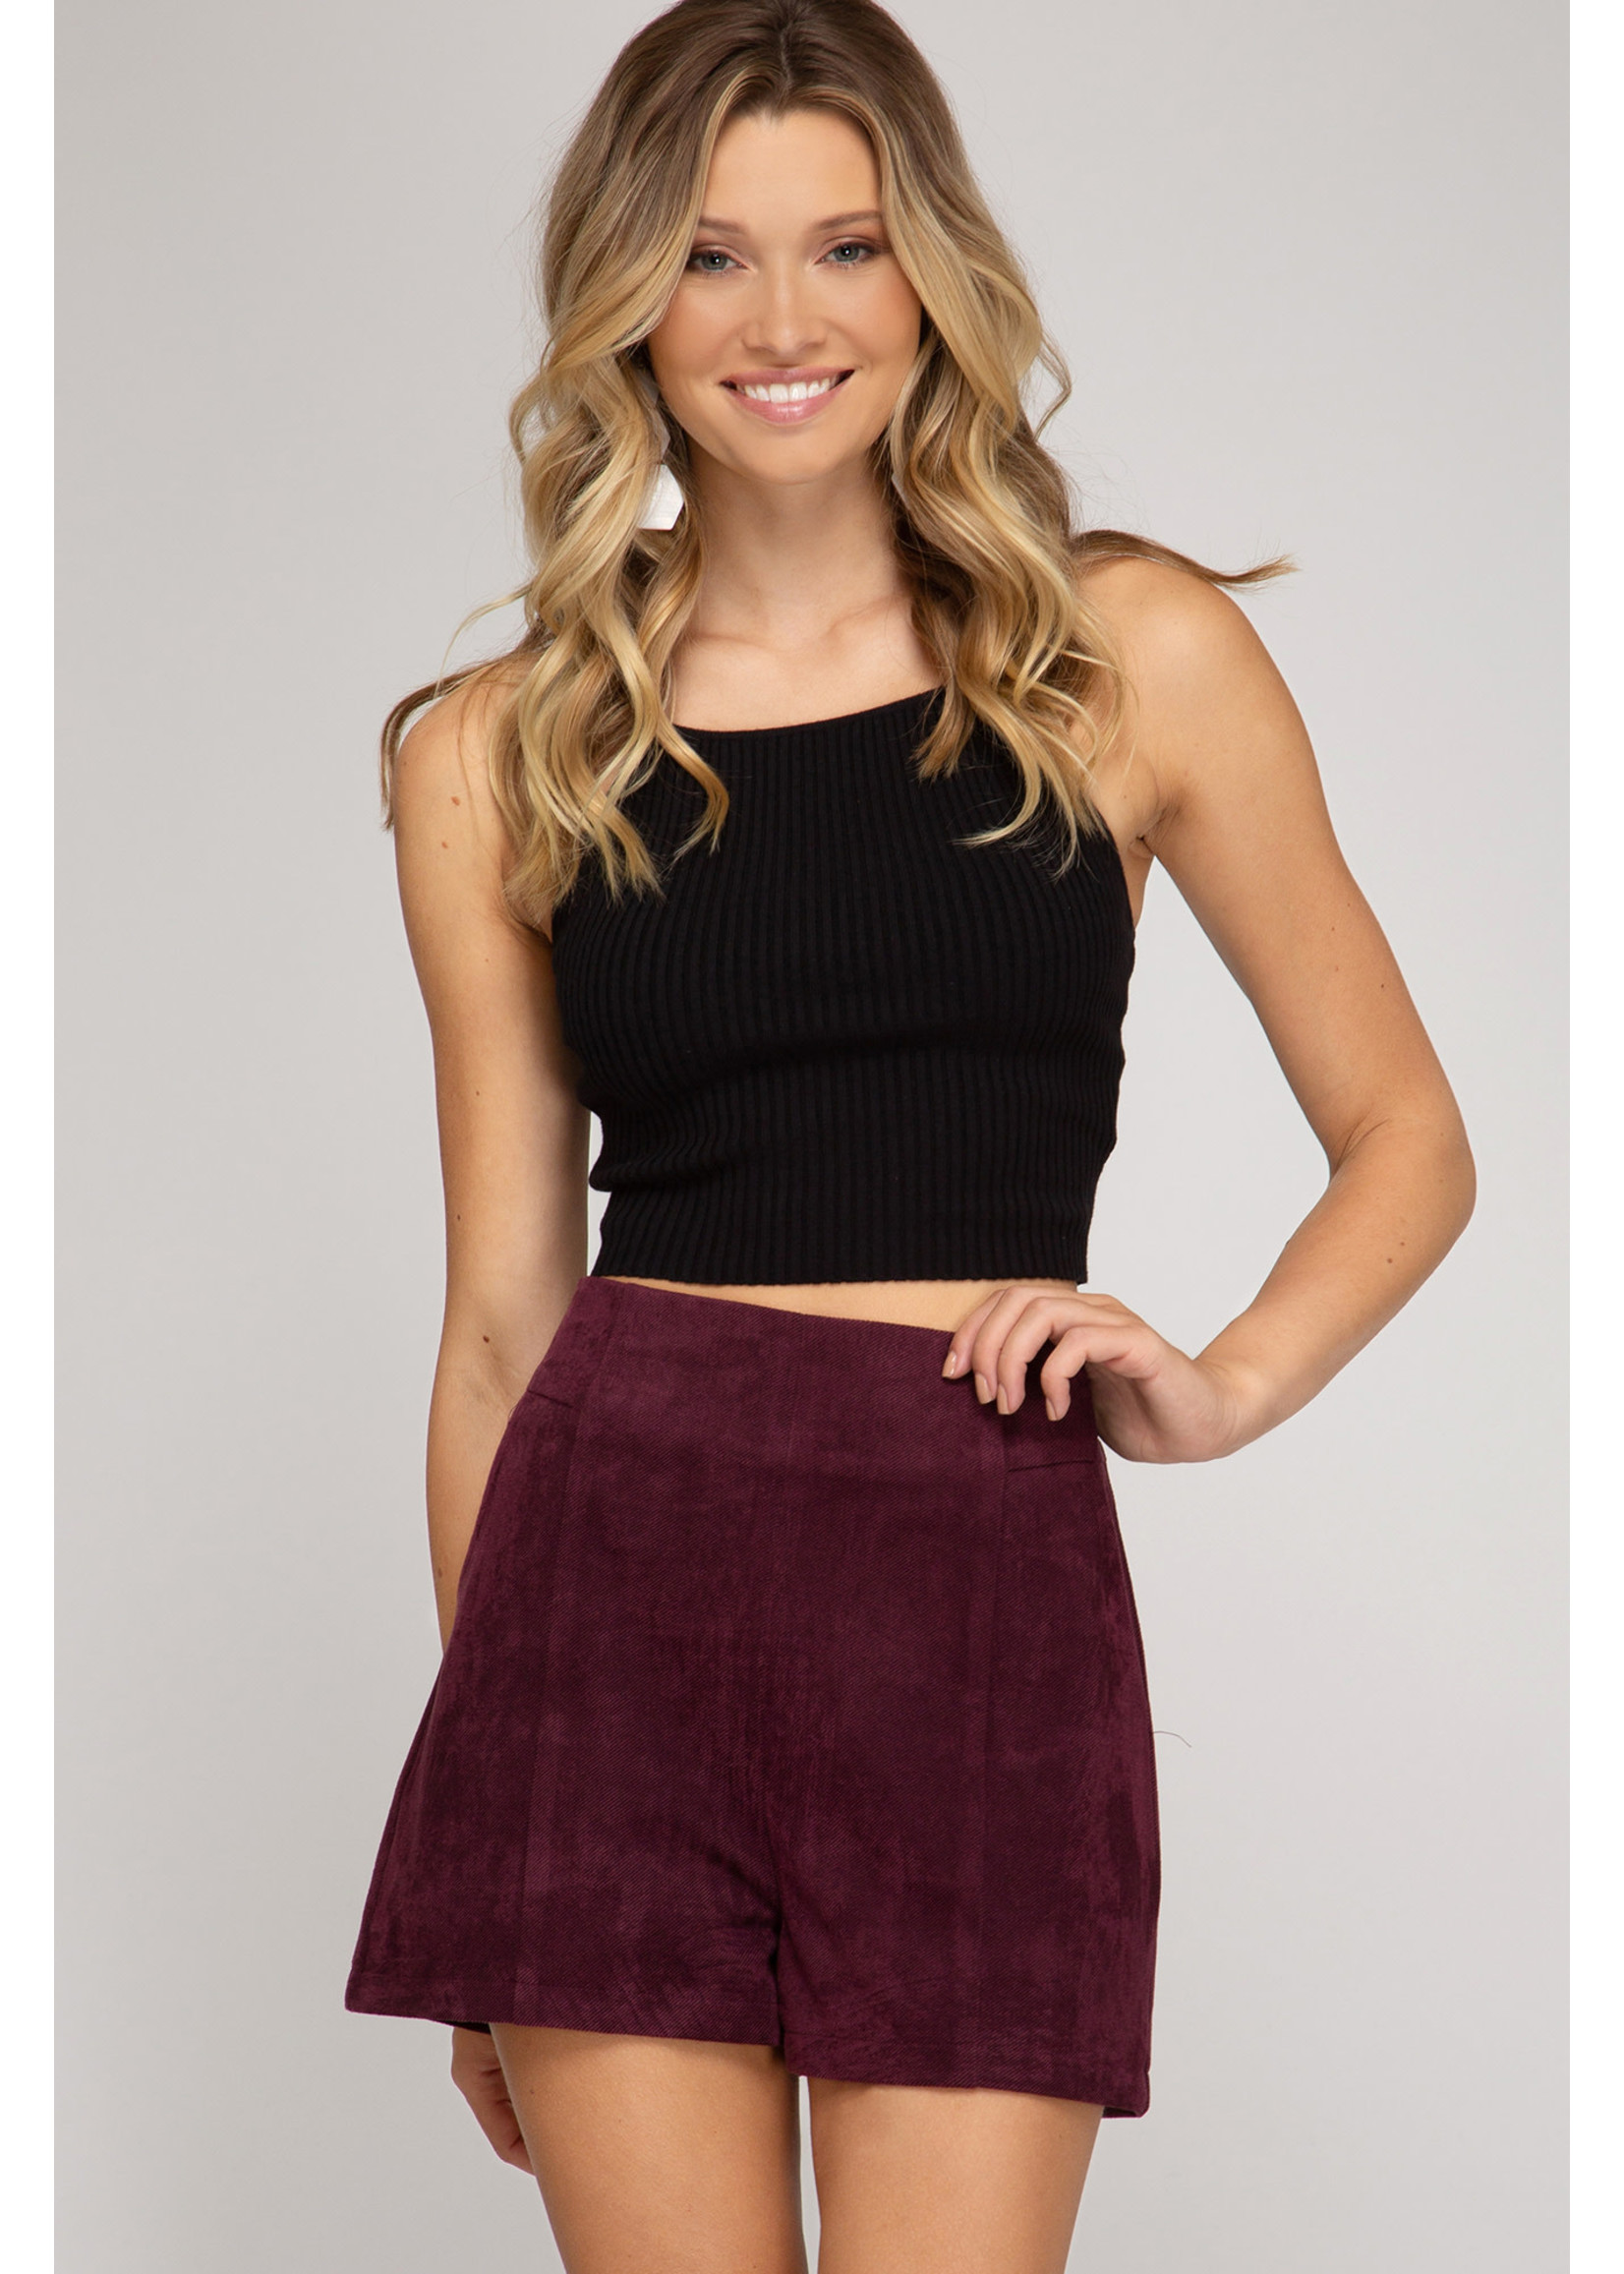 She & Sky Plum Shorts